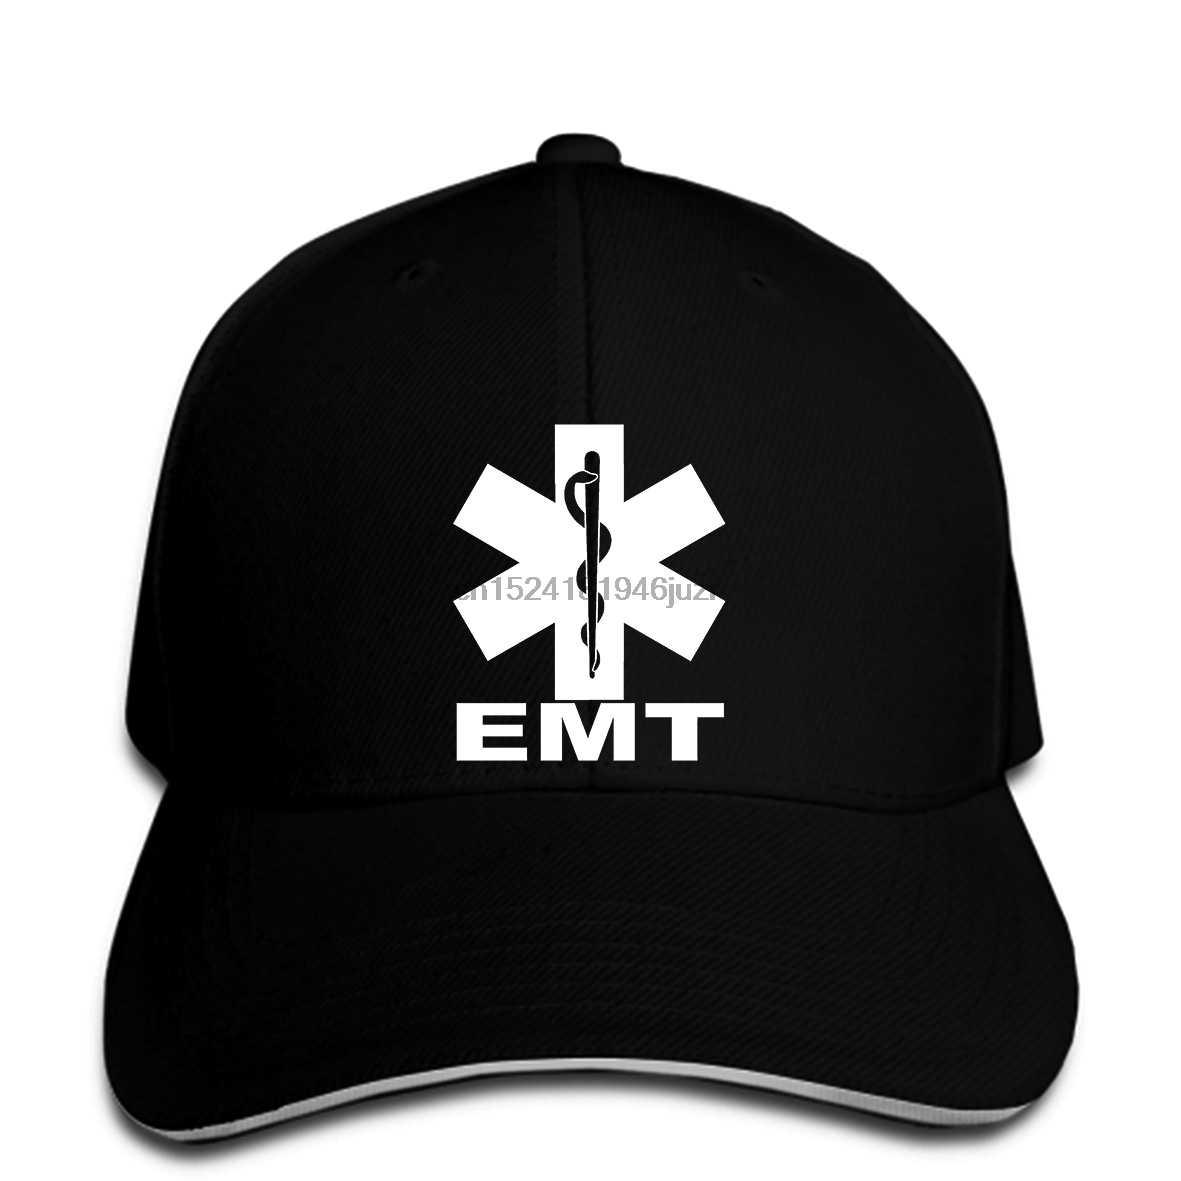 6d9e8a31c7c hip hop Baseball caps EMT EMS Paramedic Emergency Medical Services Front  Back Men snapback